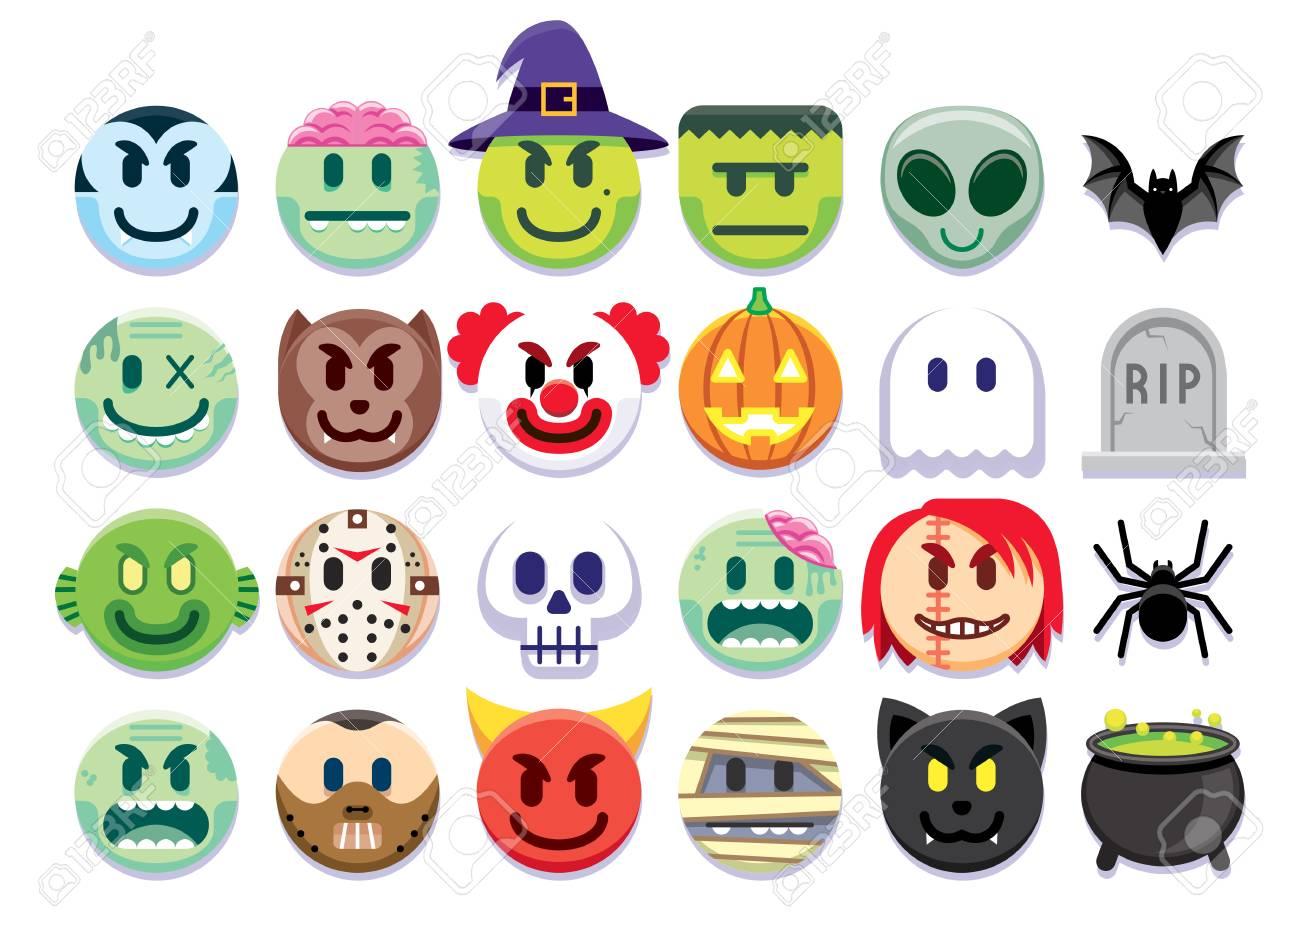 Halloween emoji clipart png free download 60 Free* Halloween Emojis, Vector, GIFs | Free for All png free download